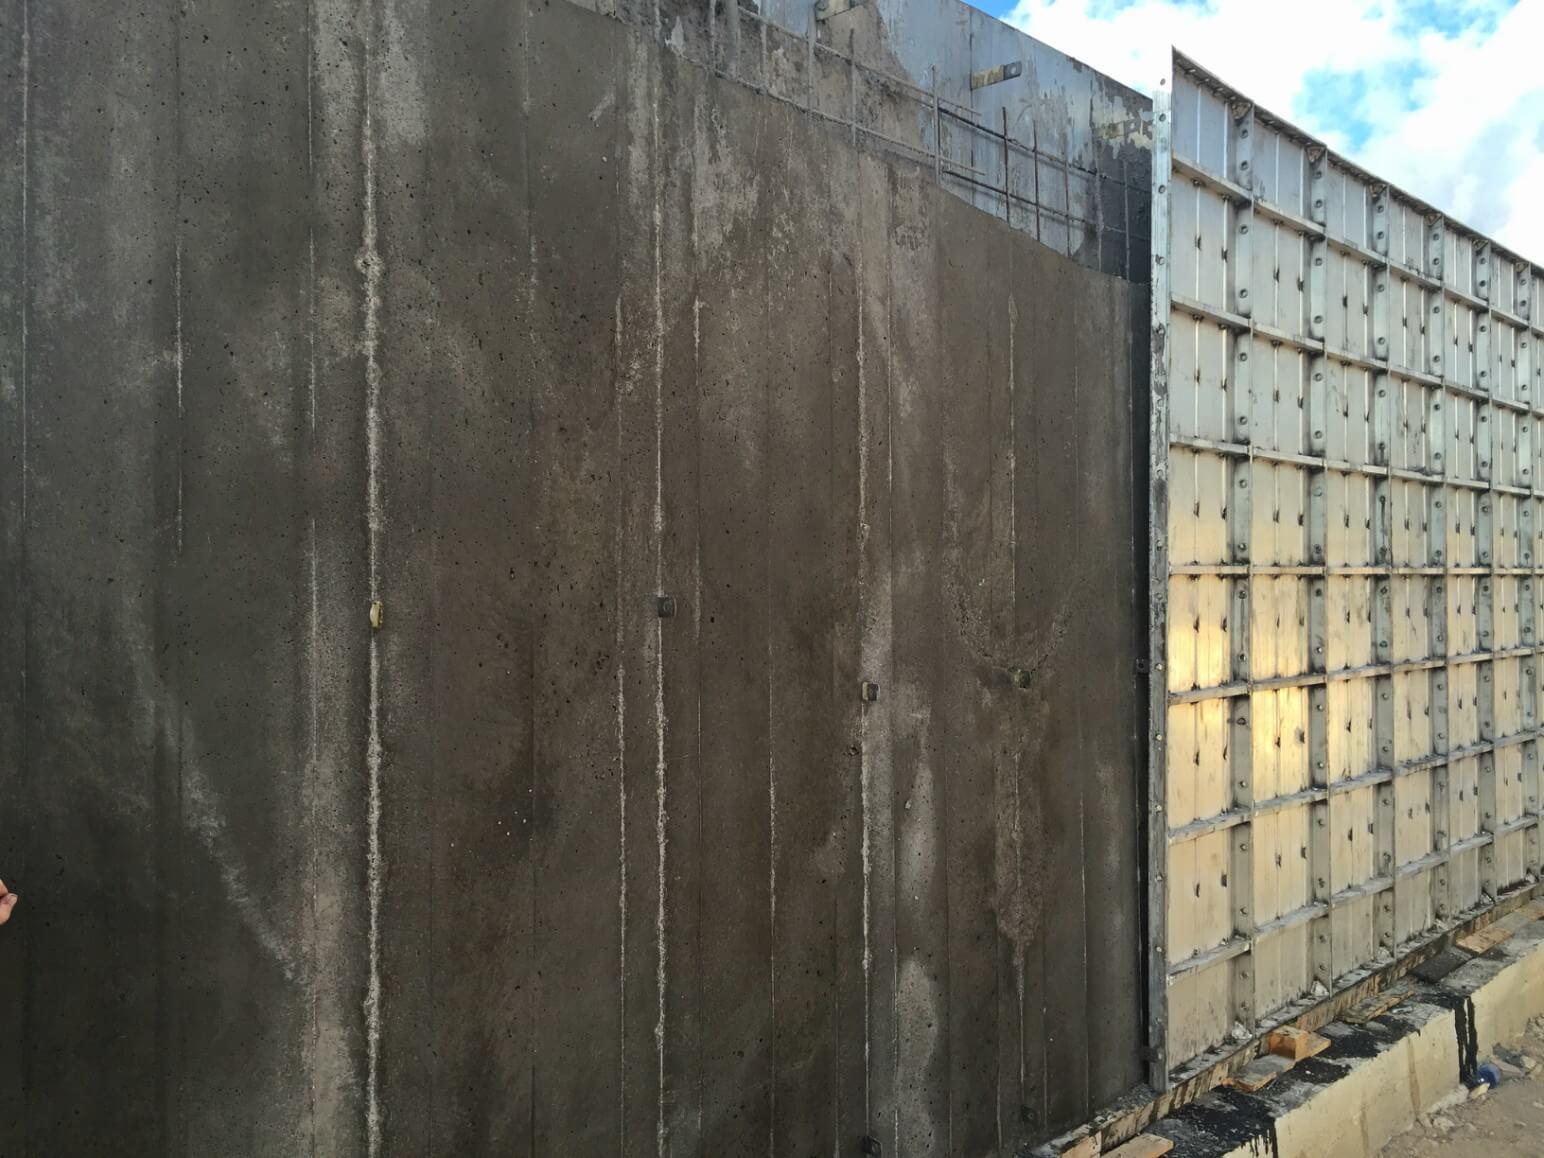 proyecto muro perimetral encofrados de aluminio construccion strong forms alicante 1